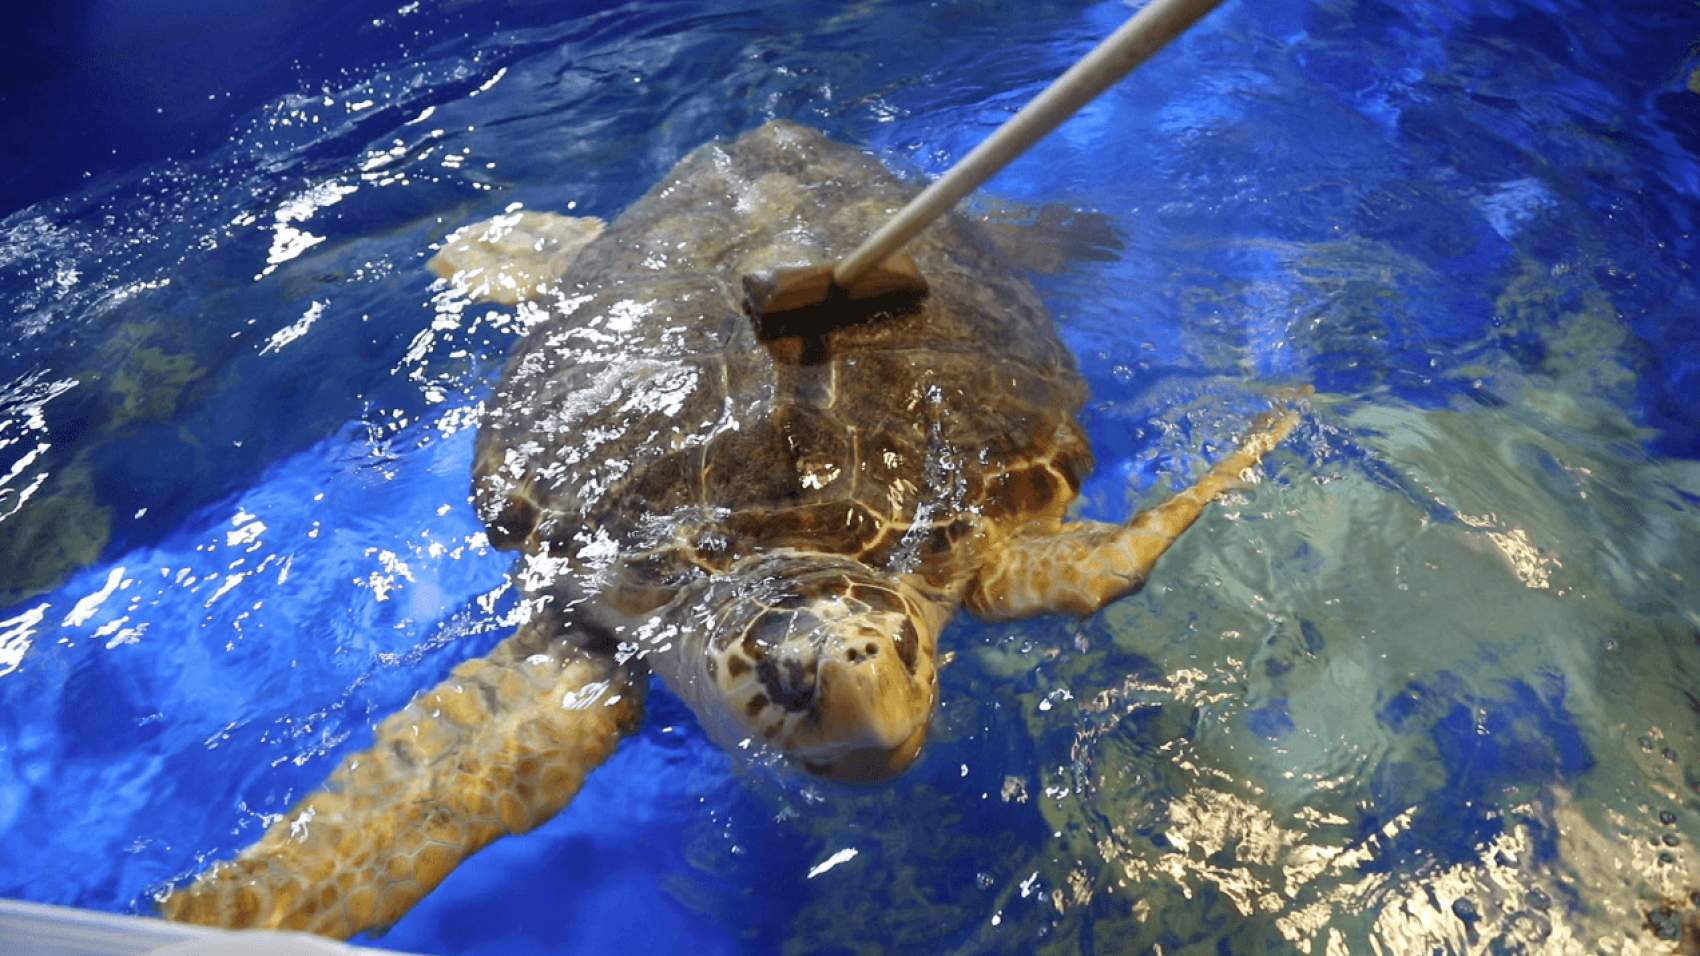 Rygmassage til havskildpadden